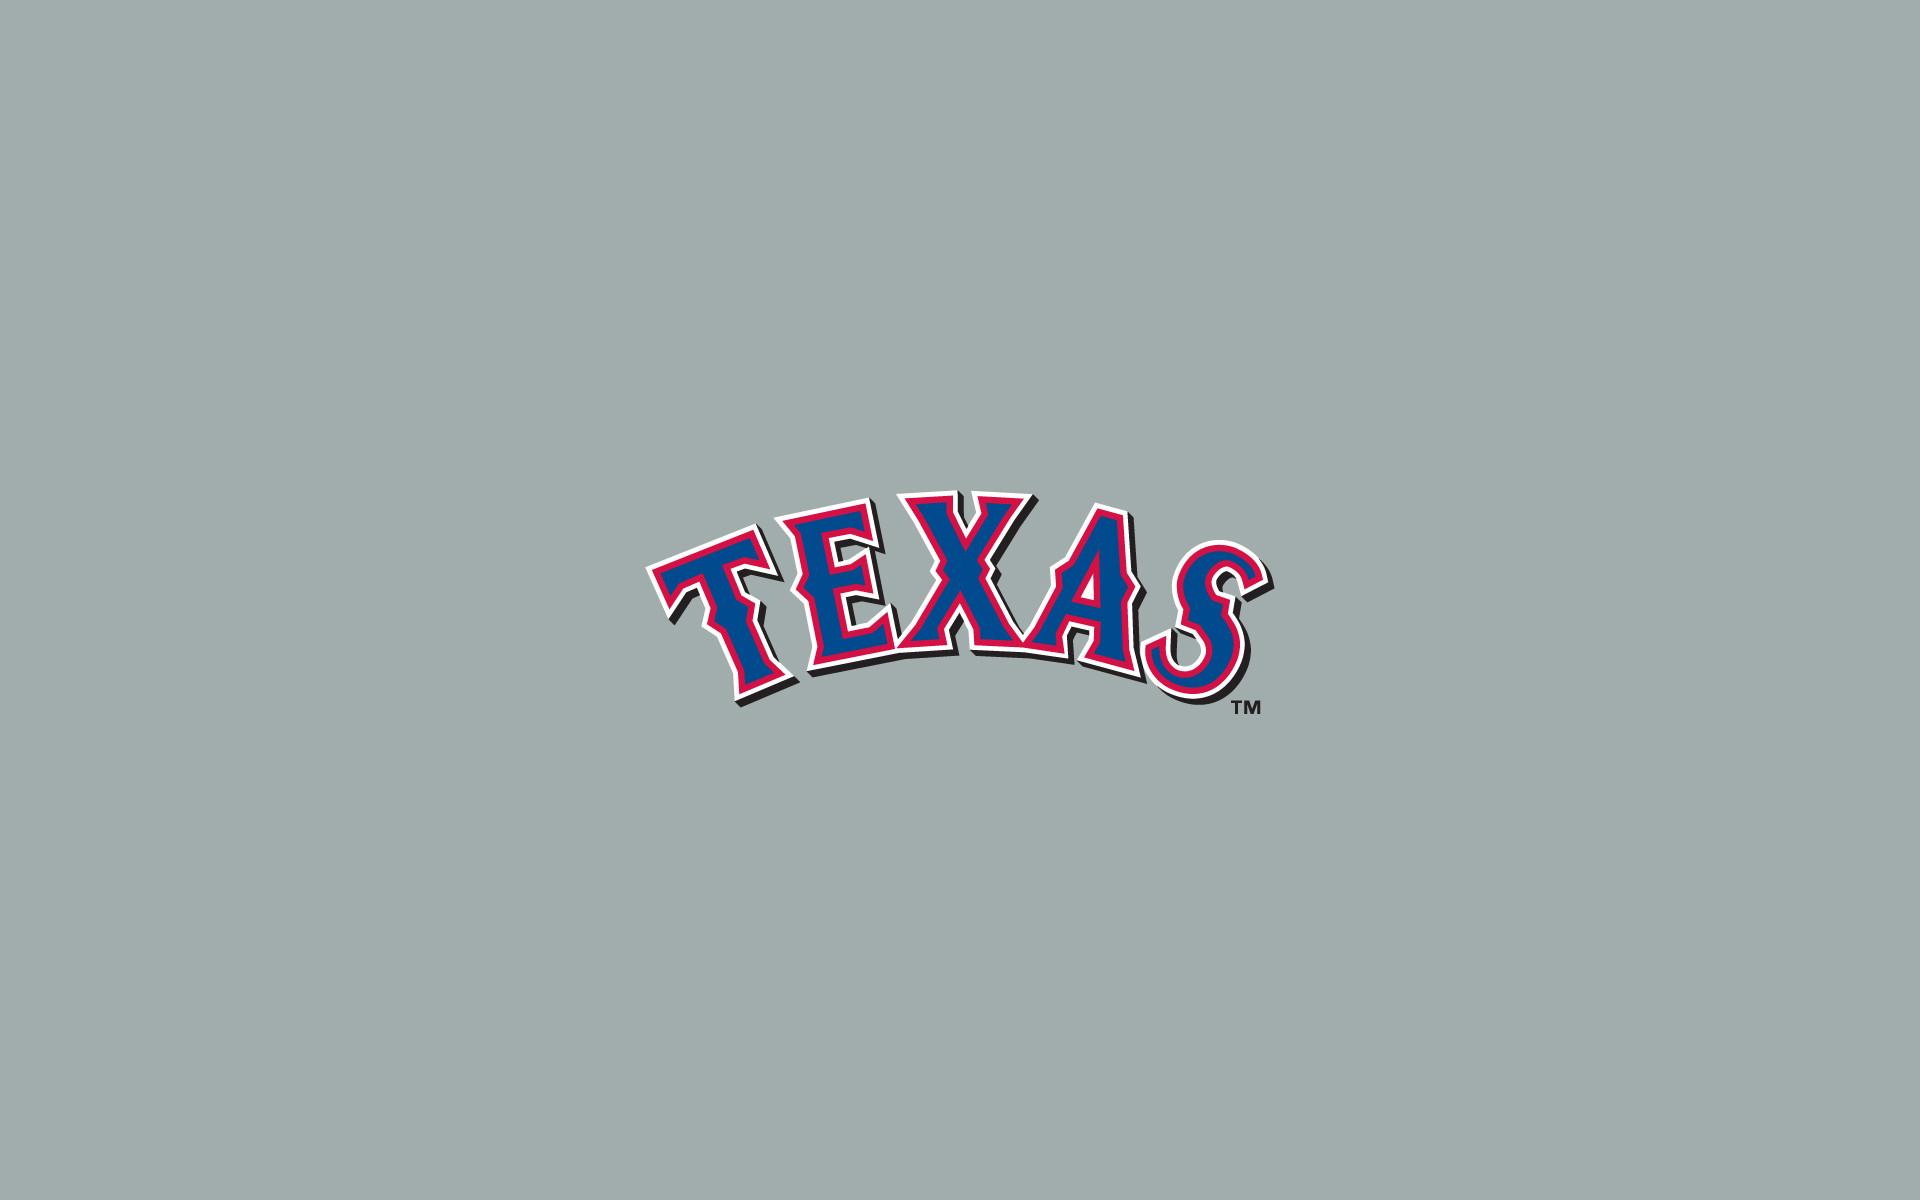 Texas Rangers wallpapers | Texas Rangers background